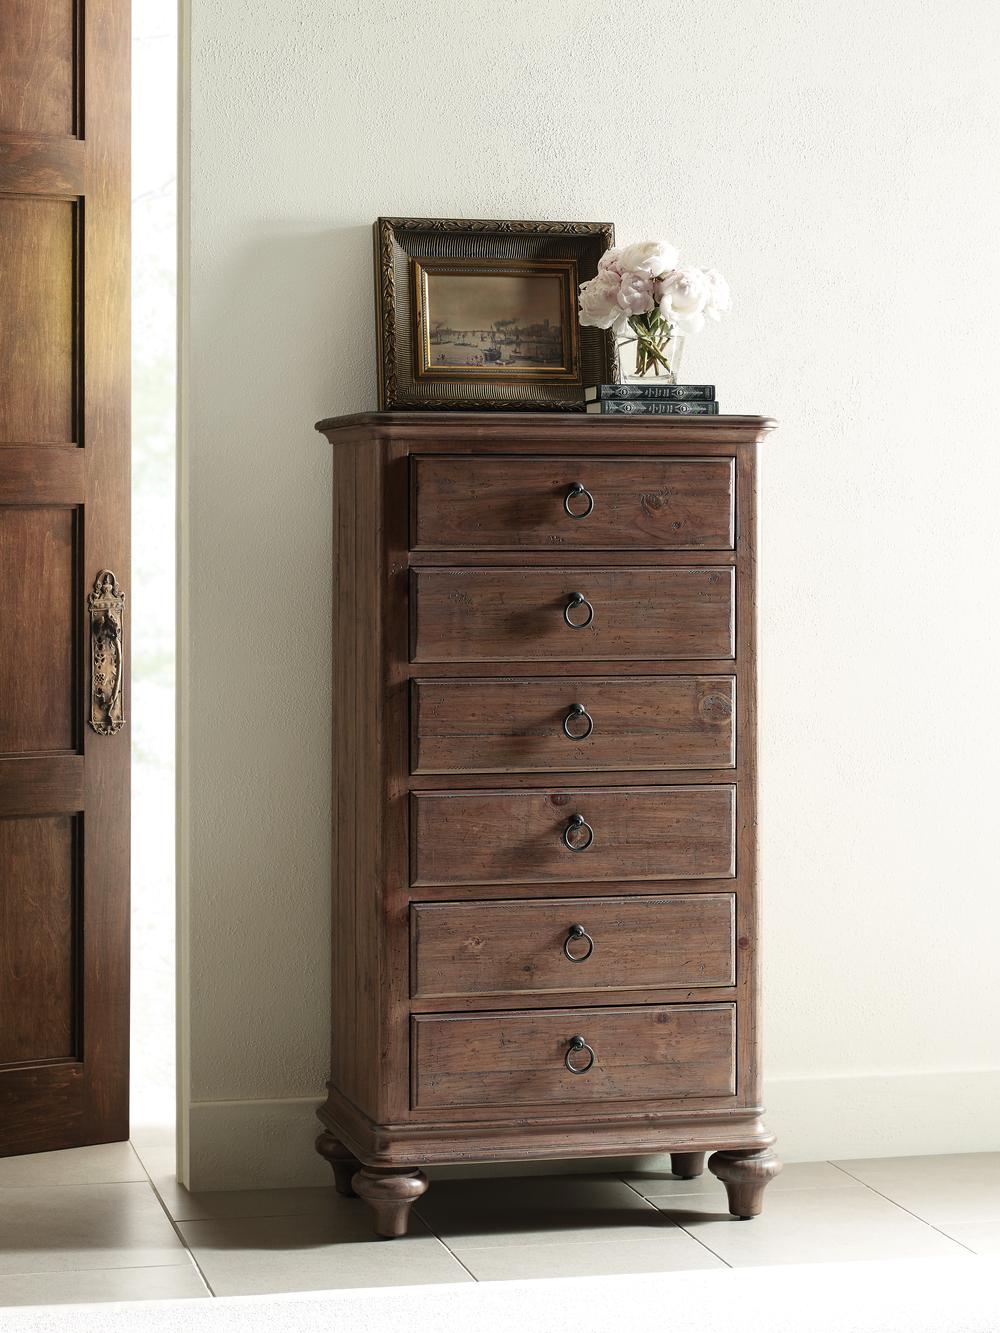 Kincaid Furniture - Devon Lingerie Chest